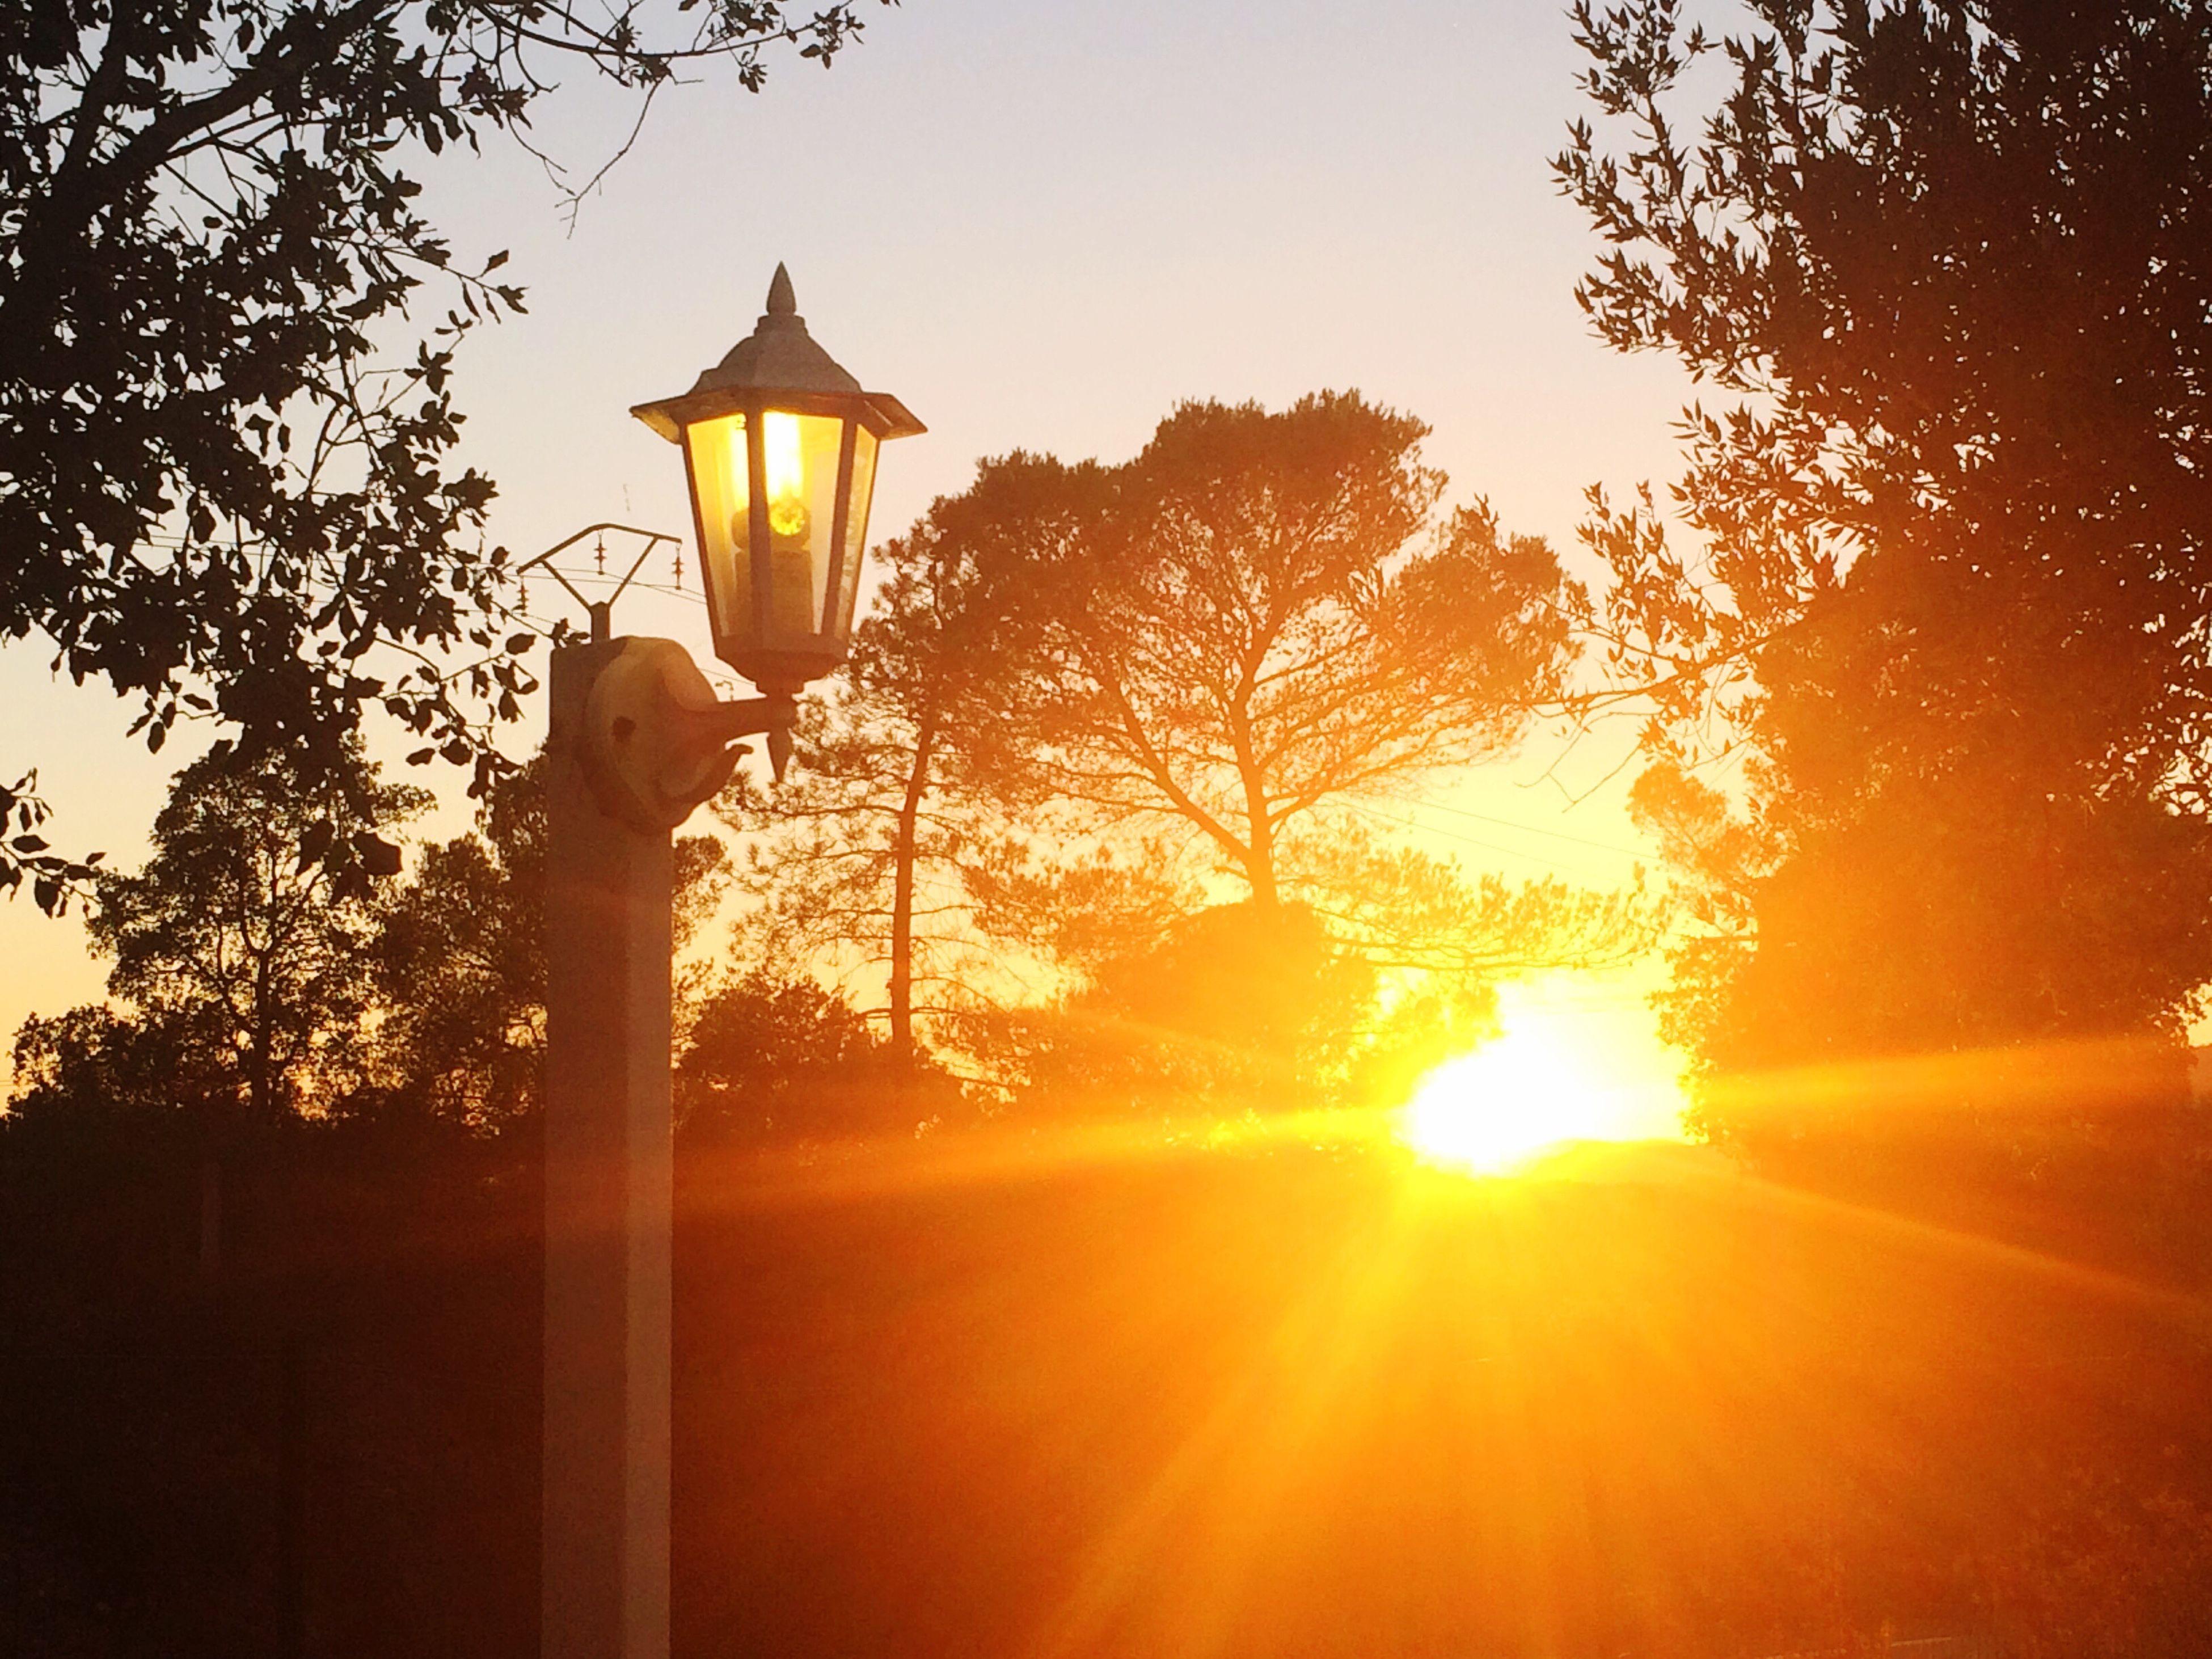 sunset, sunlight, orange color, lens flare, sun, beauty in nature, no people, nature, sunbeam, sky, tranquil scene, tree, scenics, outdoors, sunrise, day